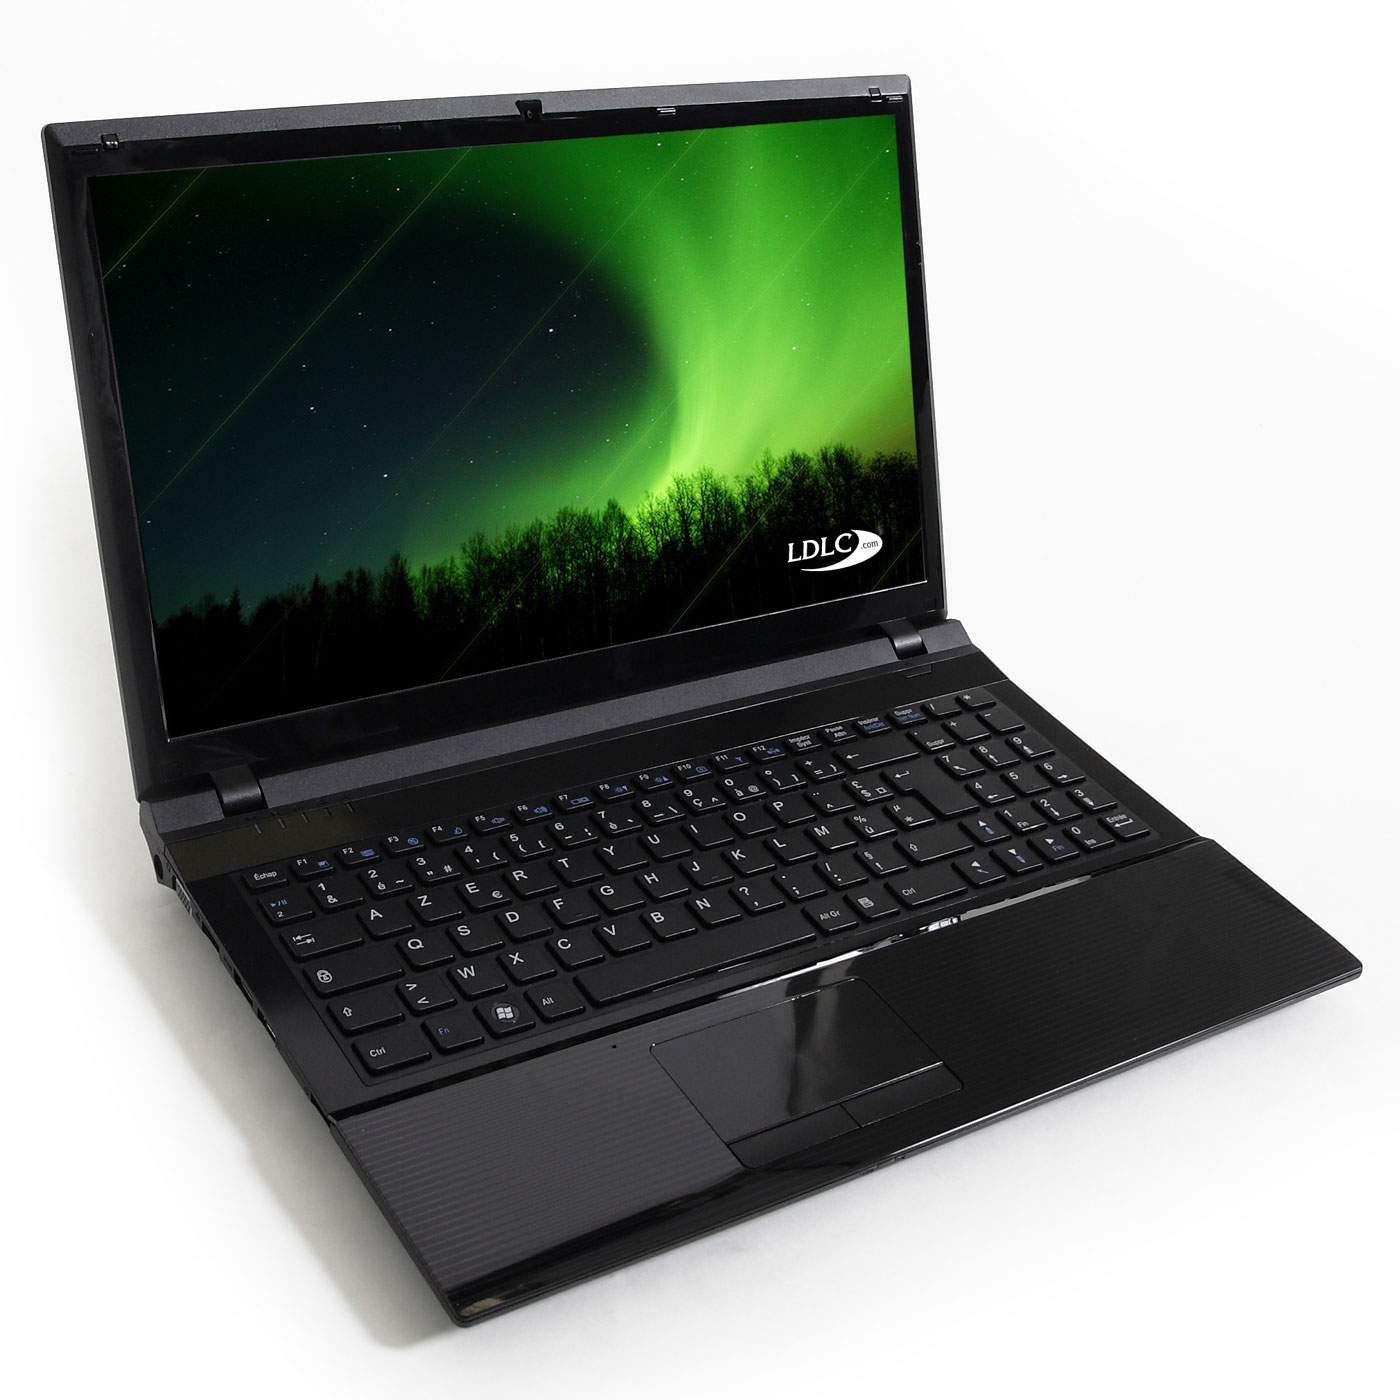 "PC portable LDLC Aurore BB1-i5-8-S1 Intel Core i5-2430M 8 Go SSD 128 Go 15.6"" LED Graveur DVD Wi-Fi N/Bluetooth Webcam (sans OS)"